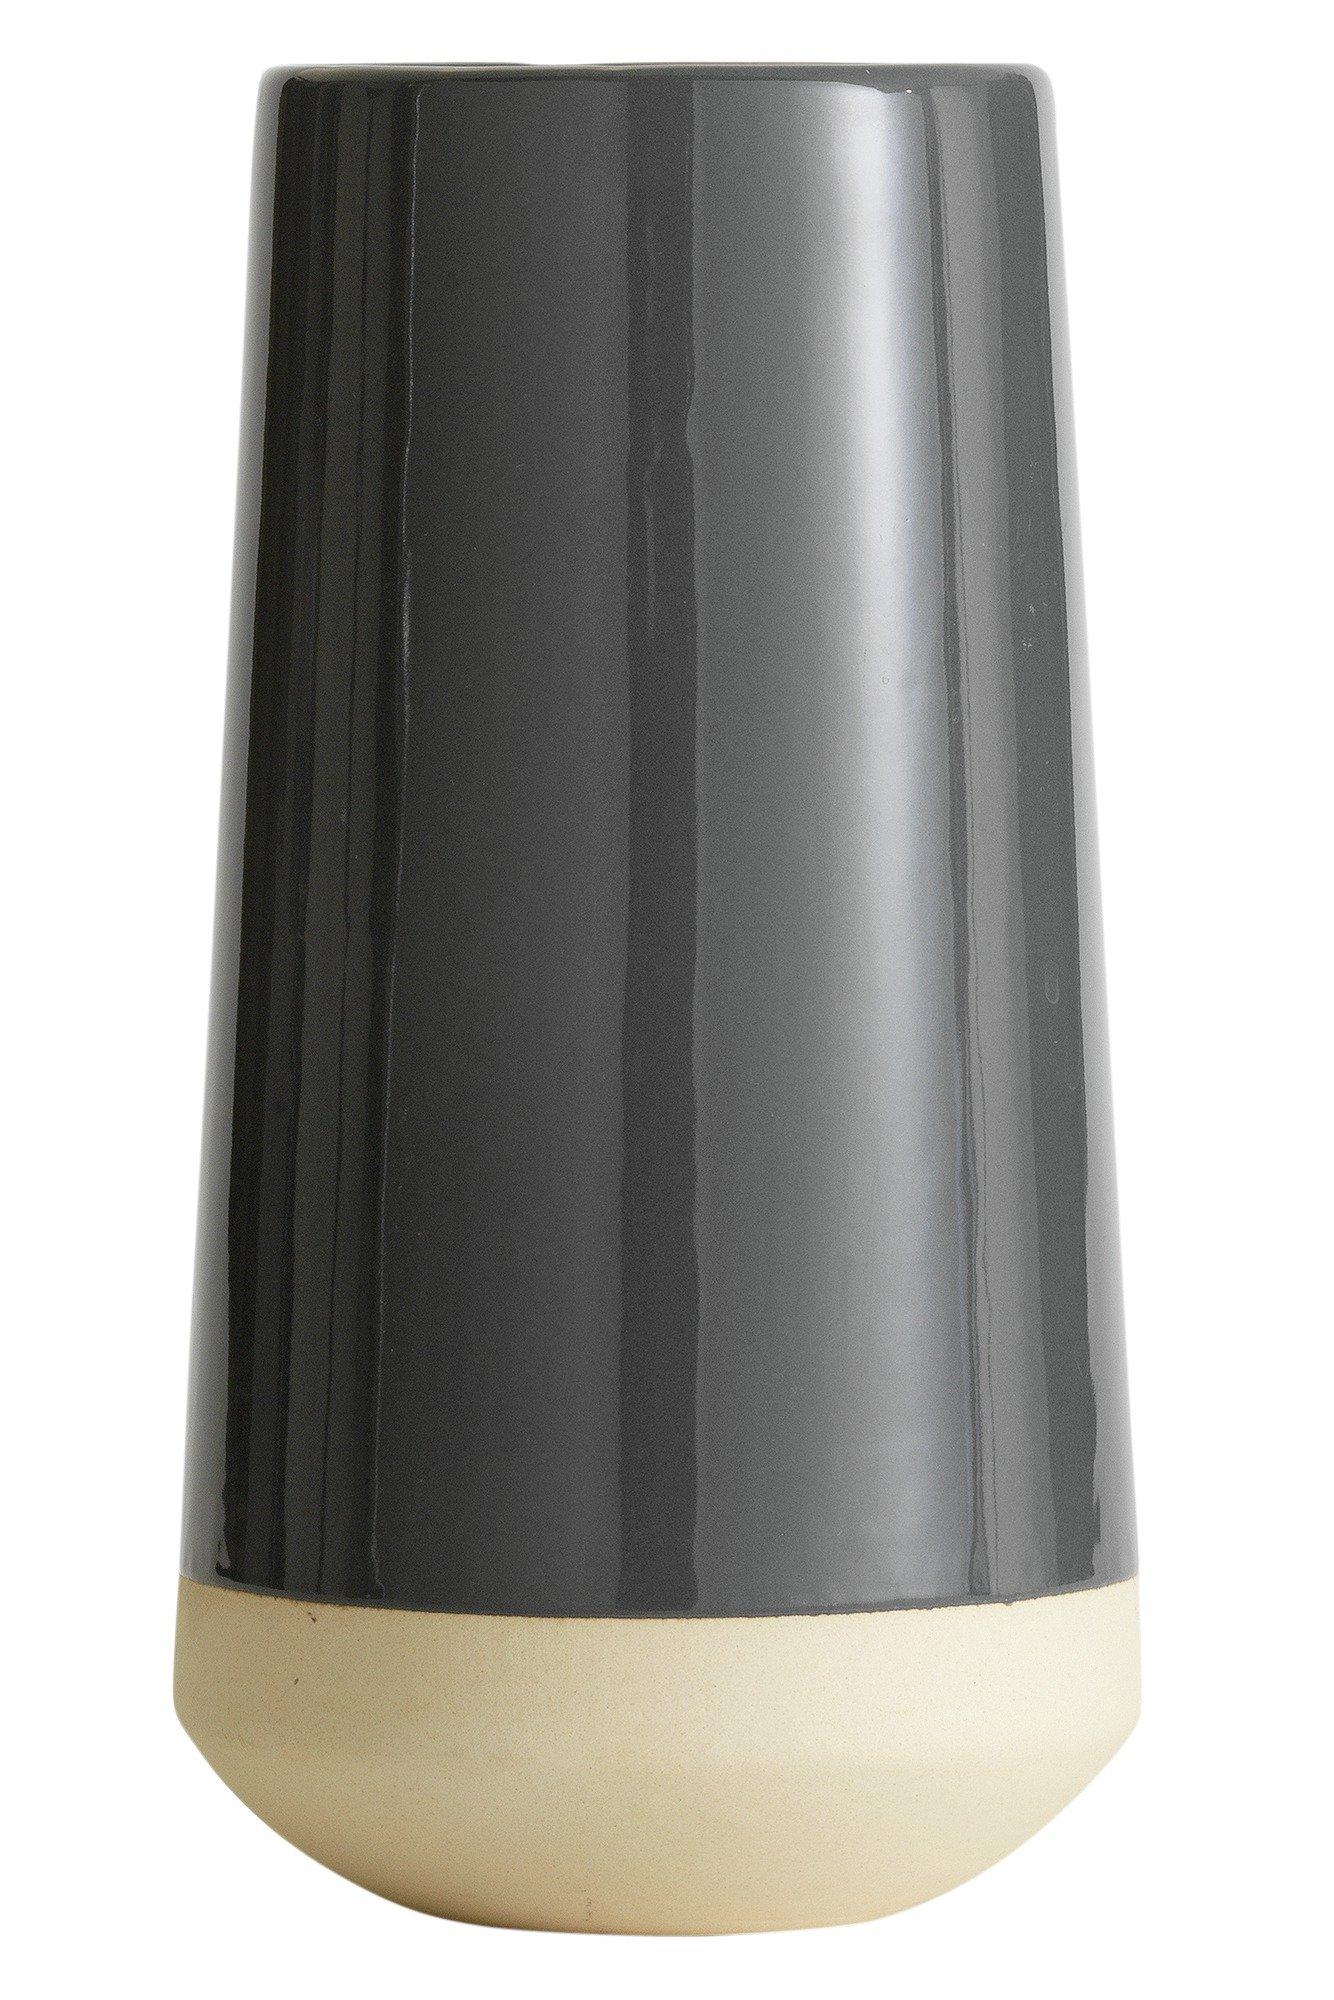 colour-match-barrel-vase-flint-grey